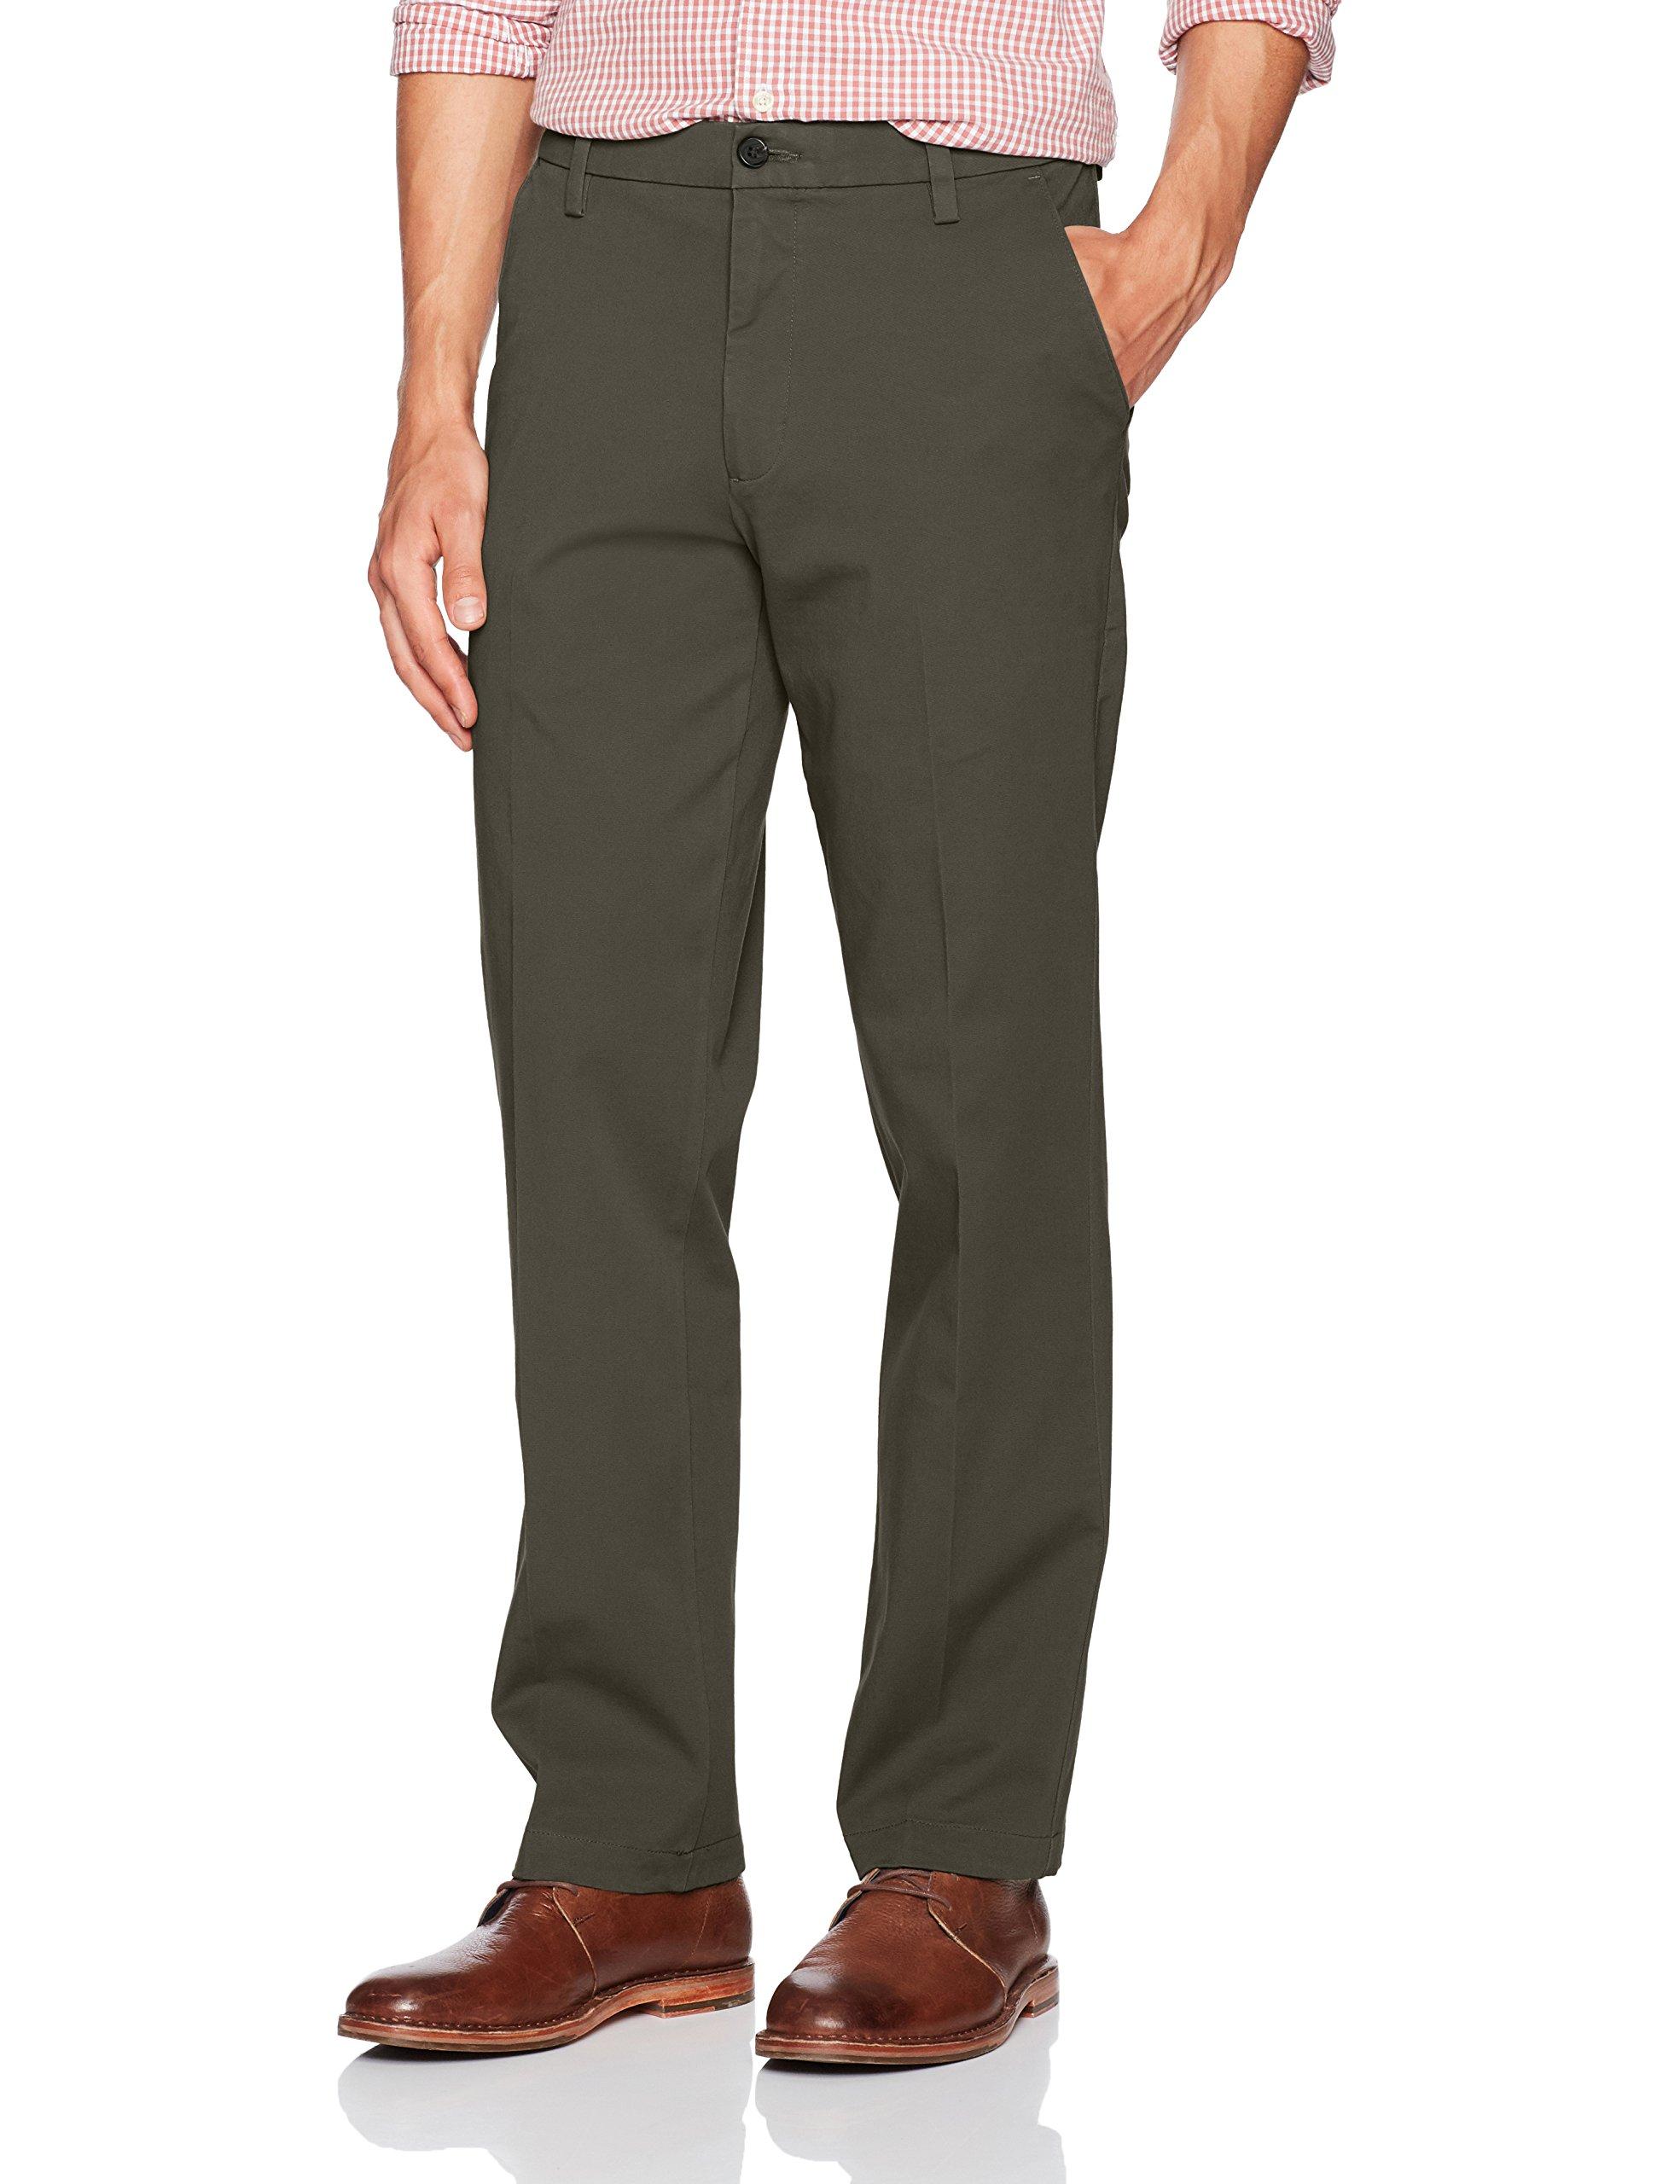 Dockers Men's Straight Fit Workday Khaki Smart 360 Flex Pants D2, Storm (Stretch), 38W x 32L